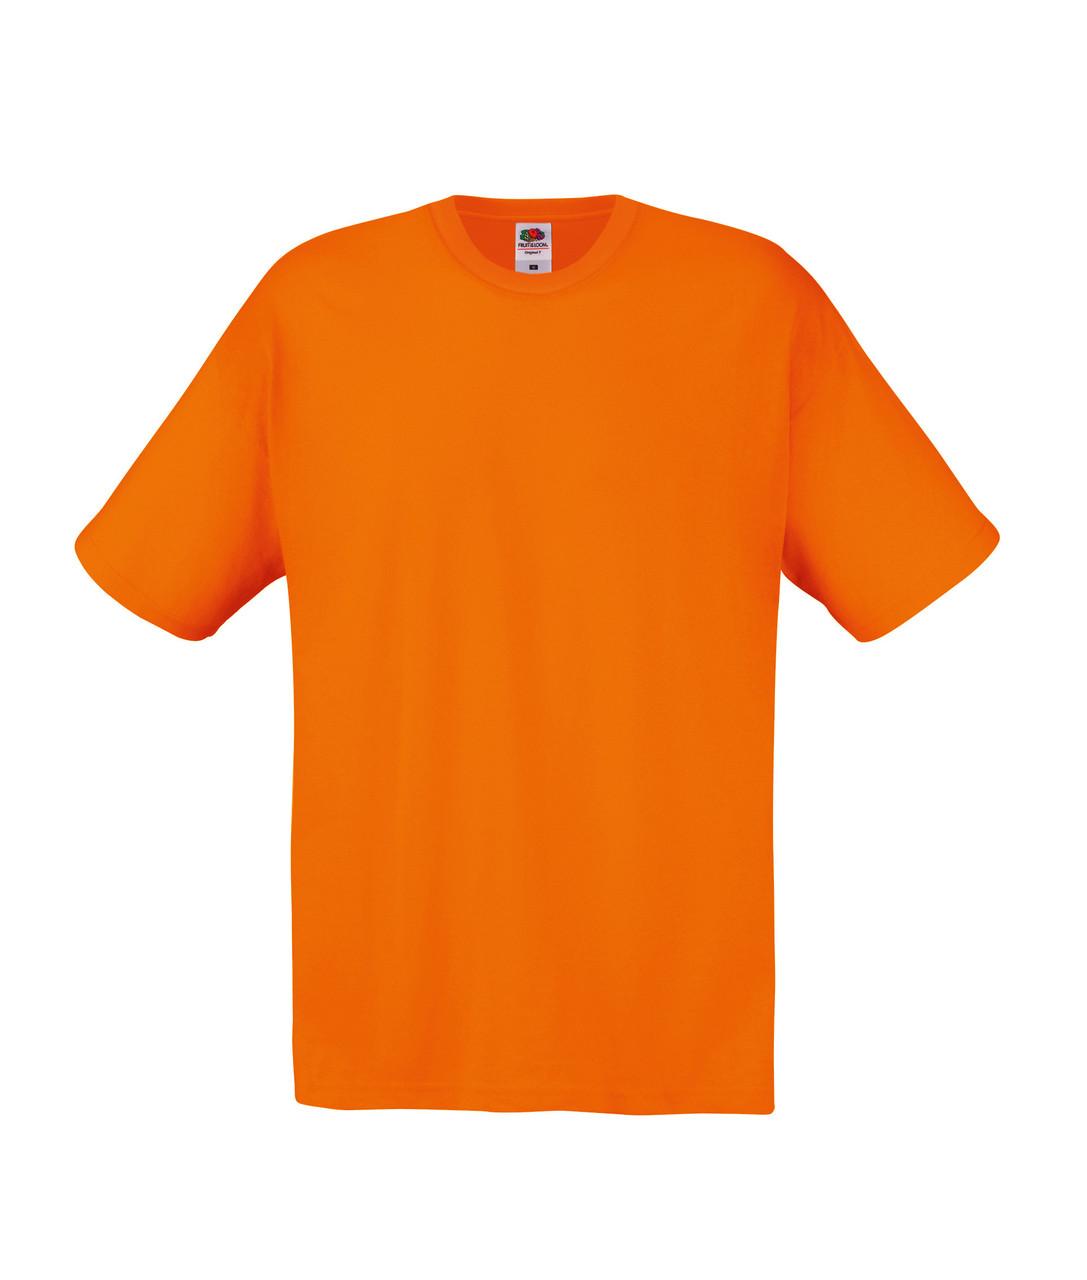 Мужская Футболка Лёгкая Fruit of the loom Оранжевый 61-082-44 Xl